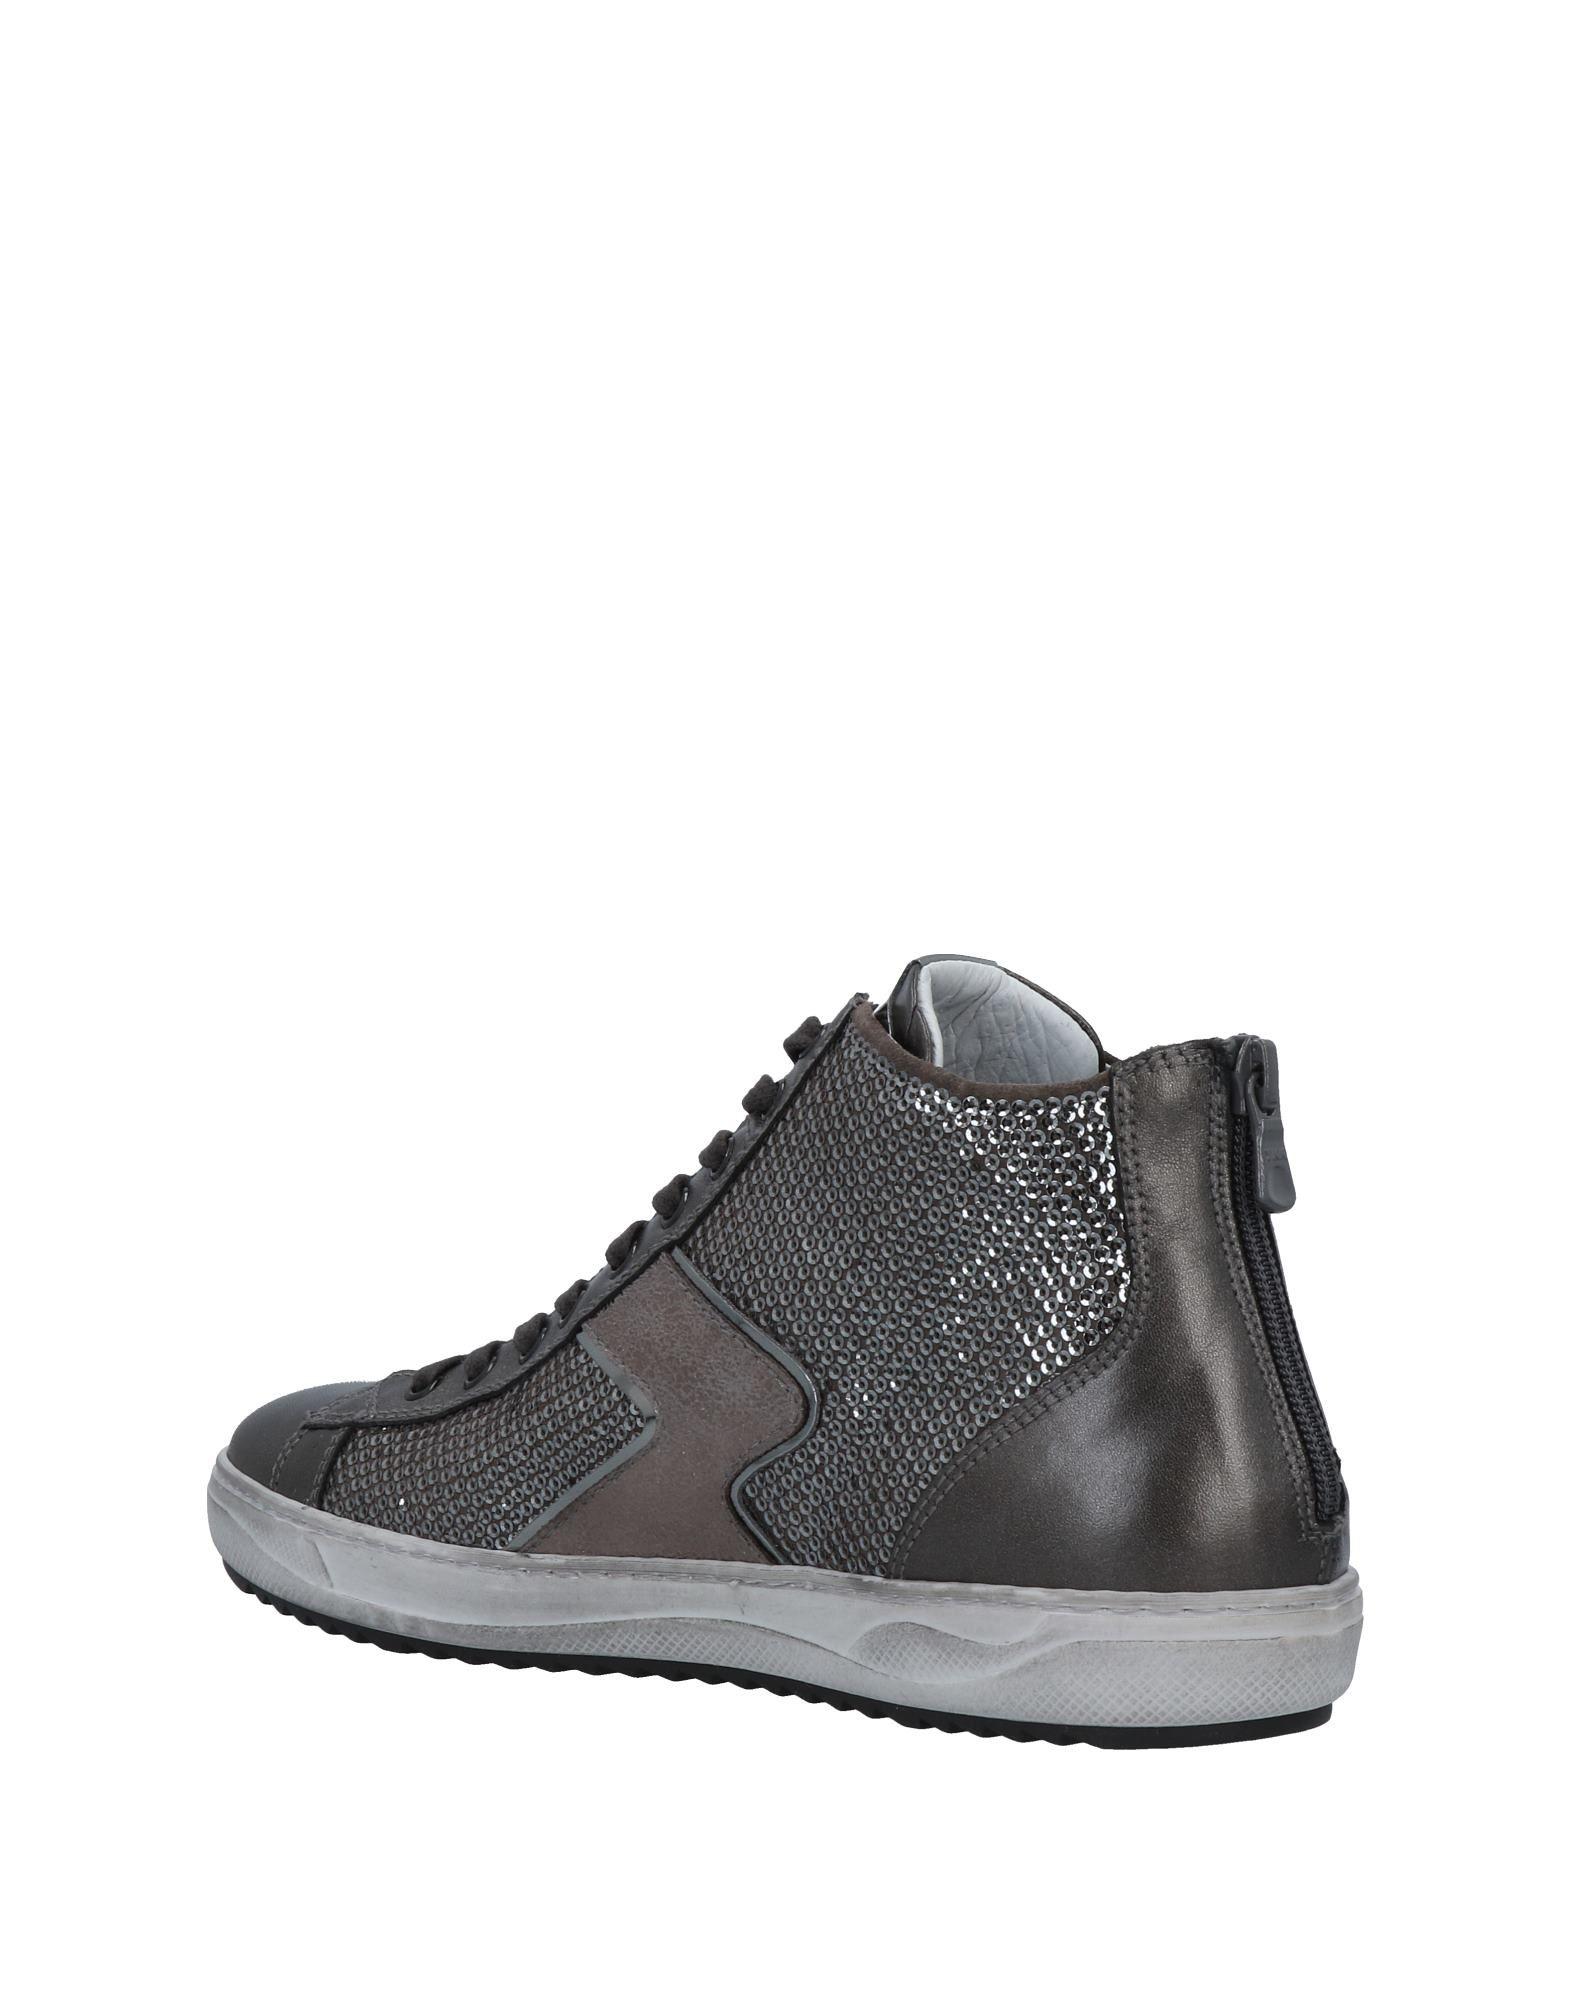 Nero Giardini Sneakers Damen 11485289EJ  11485289EJ Damen  1ddb91